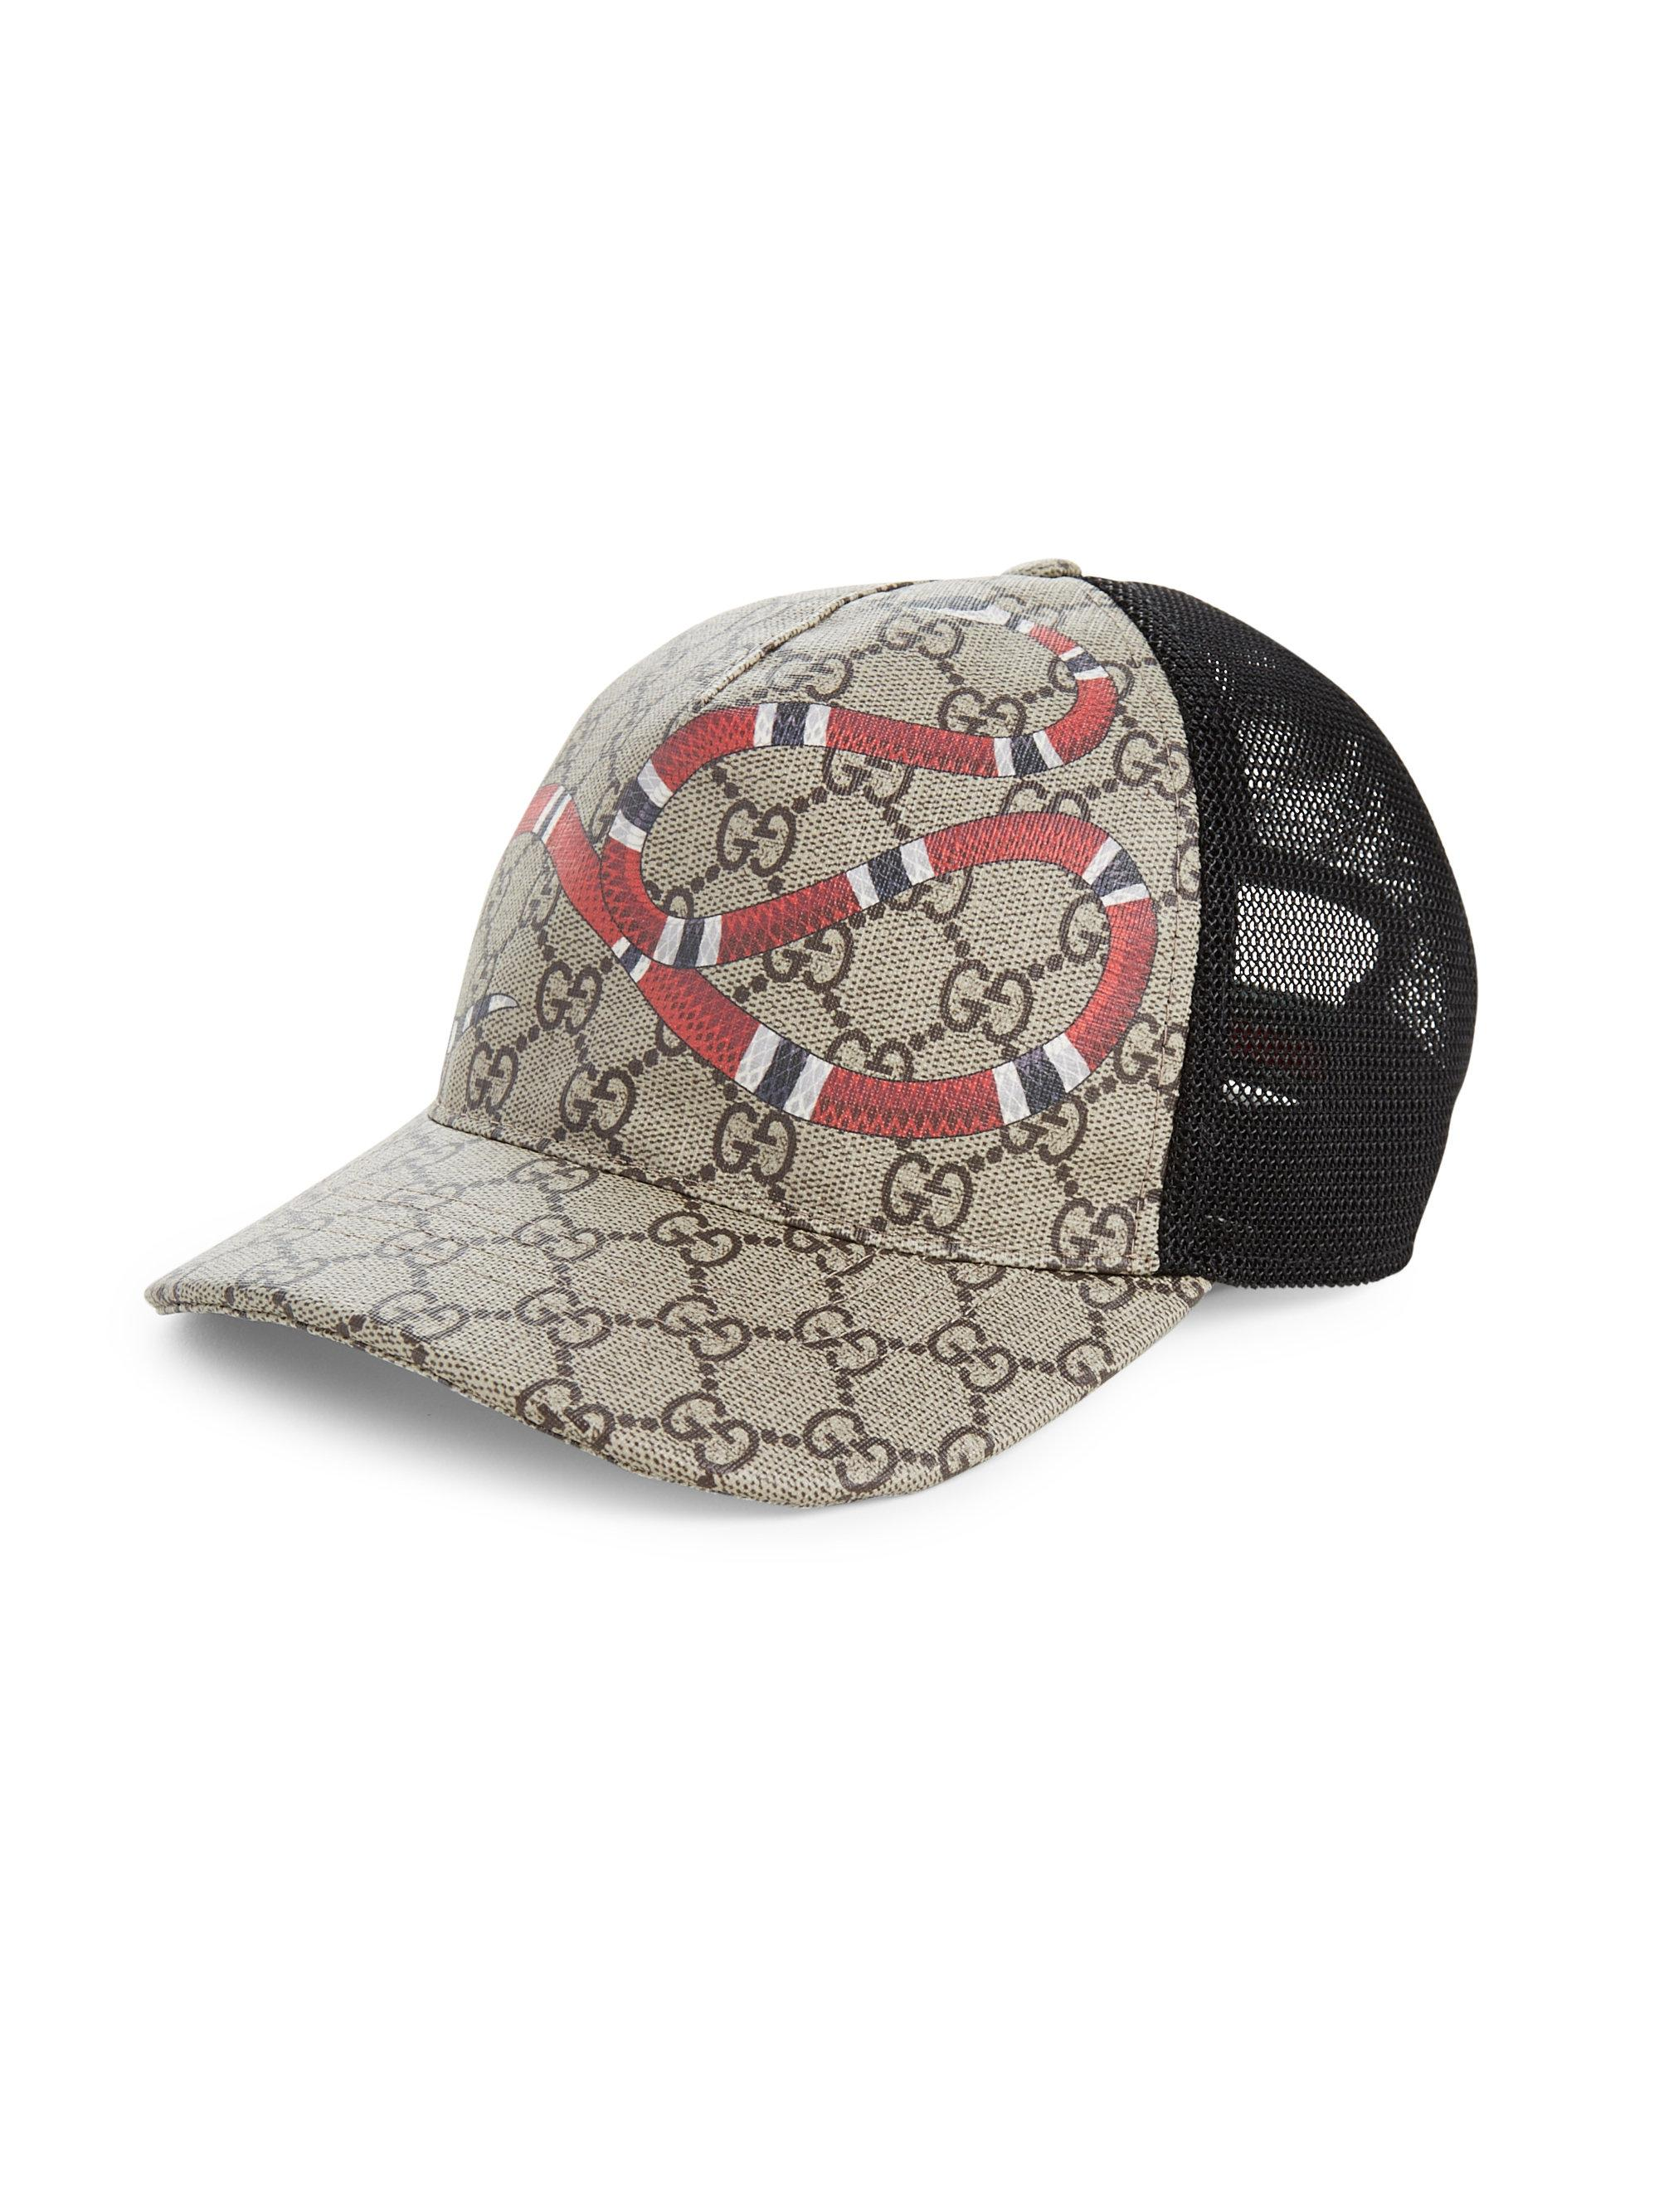 db88cf63 Gucci Snake Baseball Cap in Natural for Men - Lyst